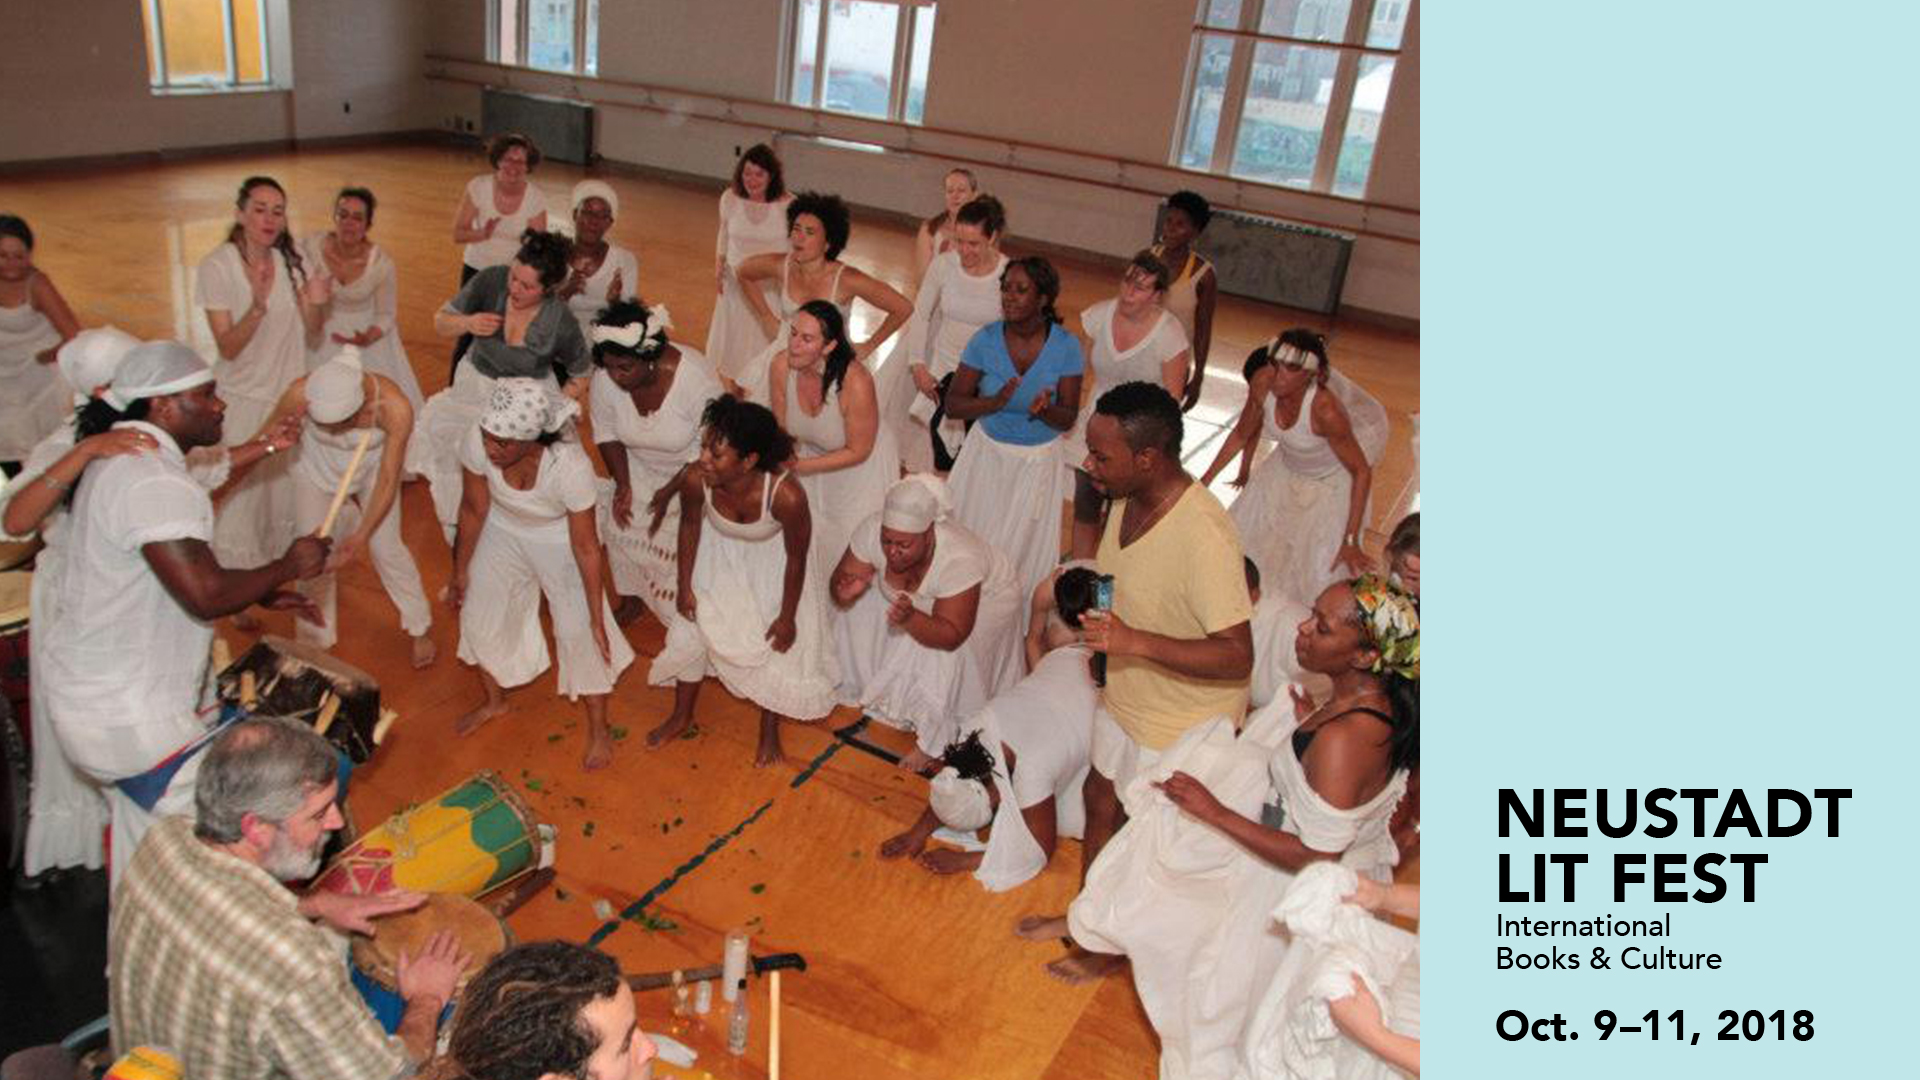 2018 Neustadt Community Dance and Drum Workshop